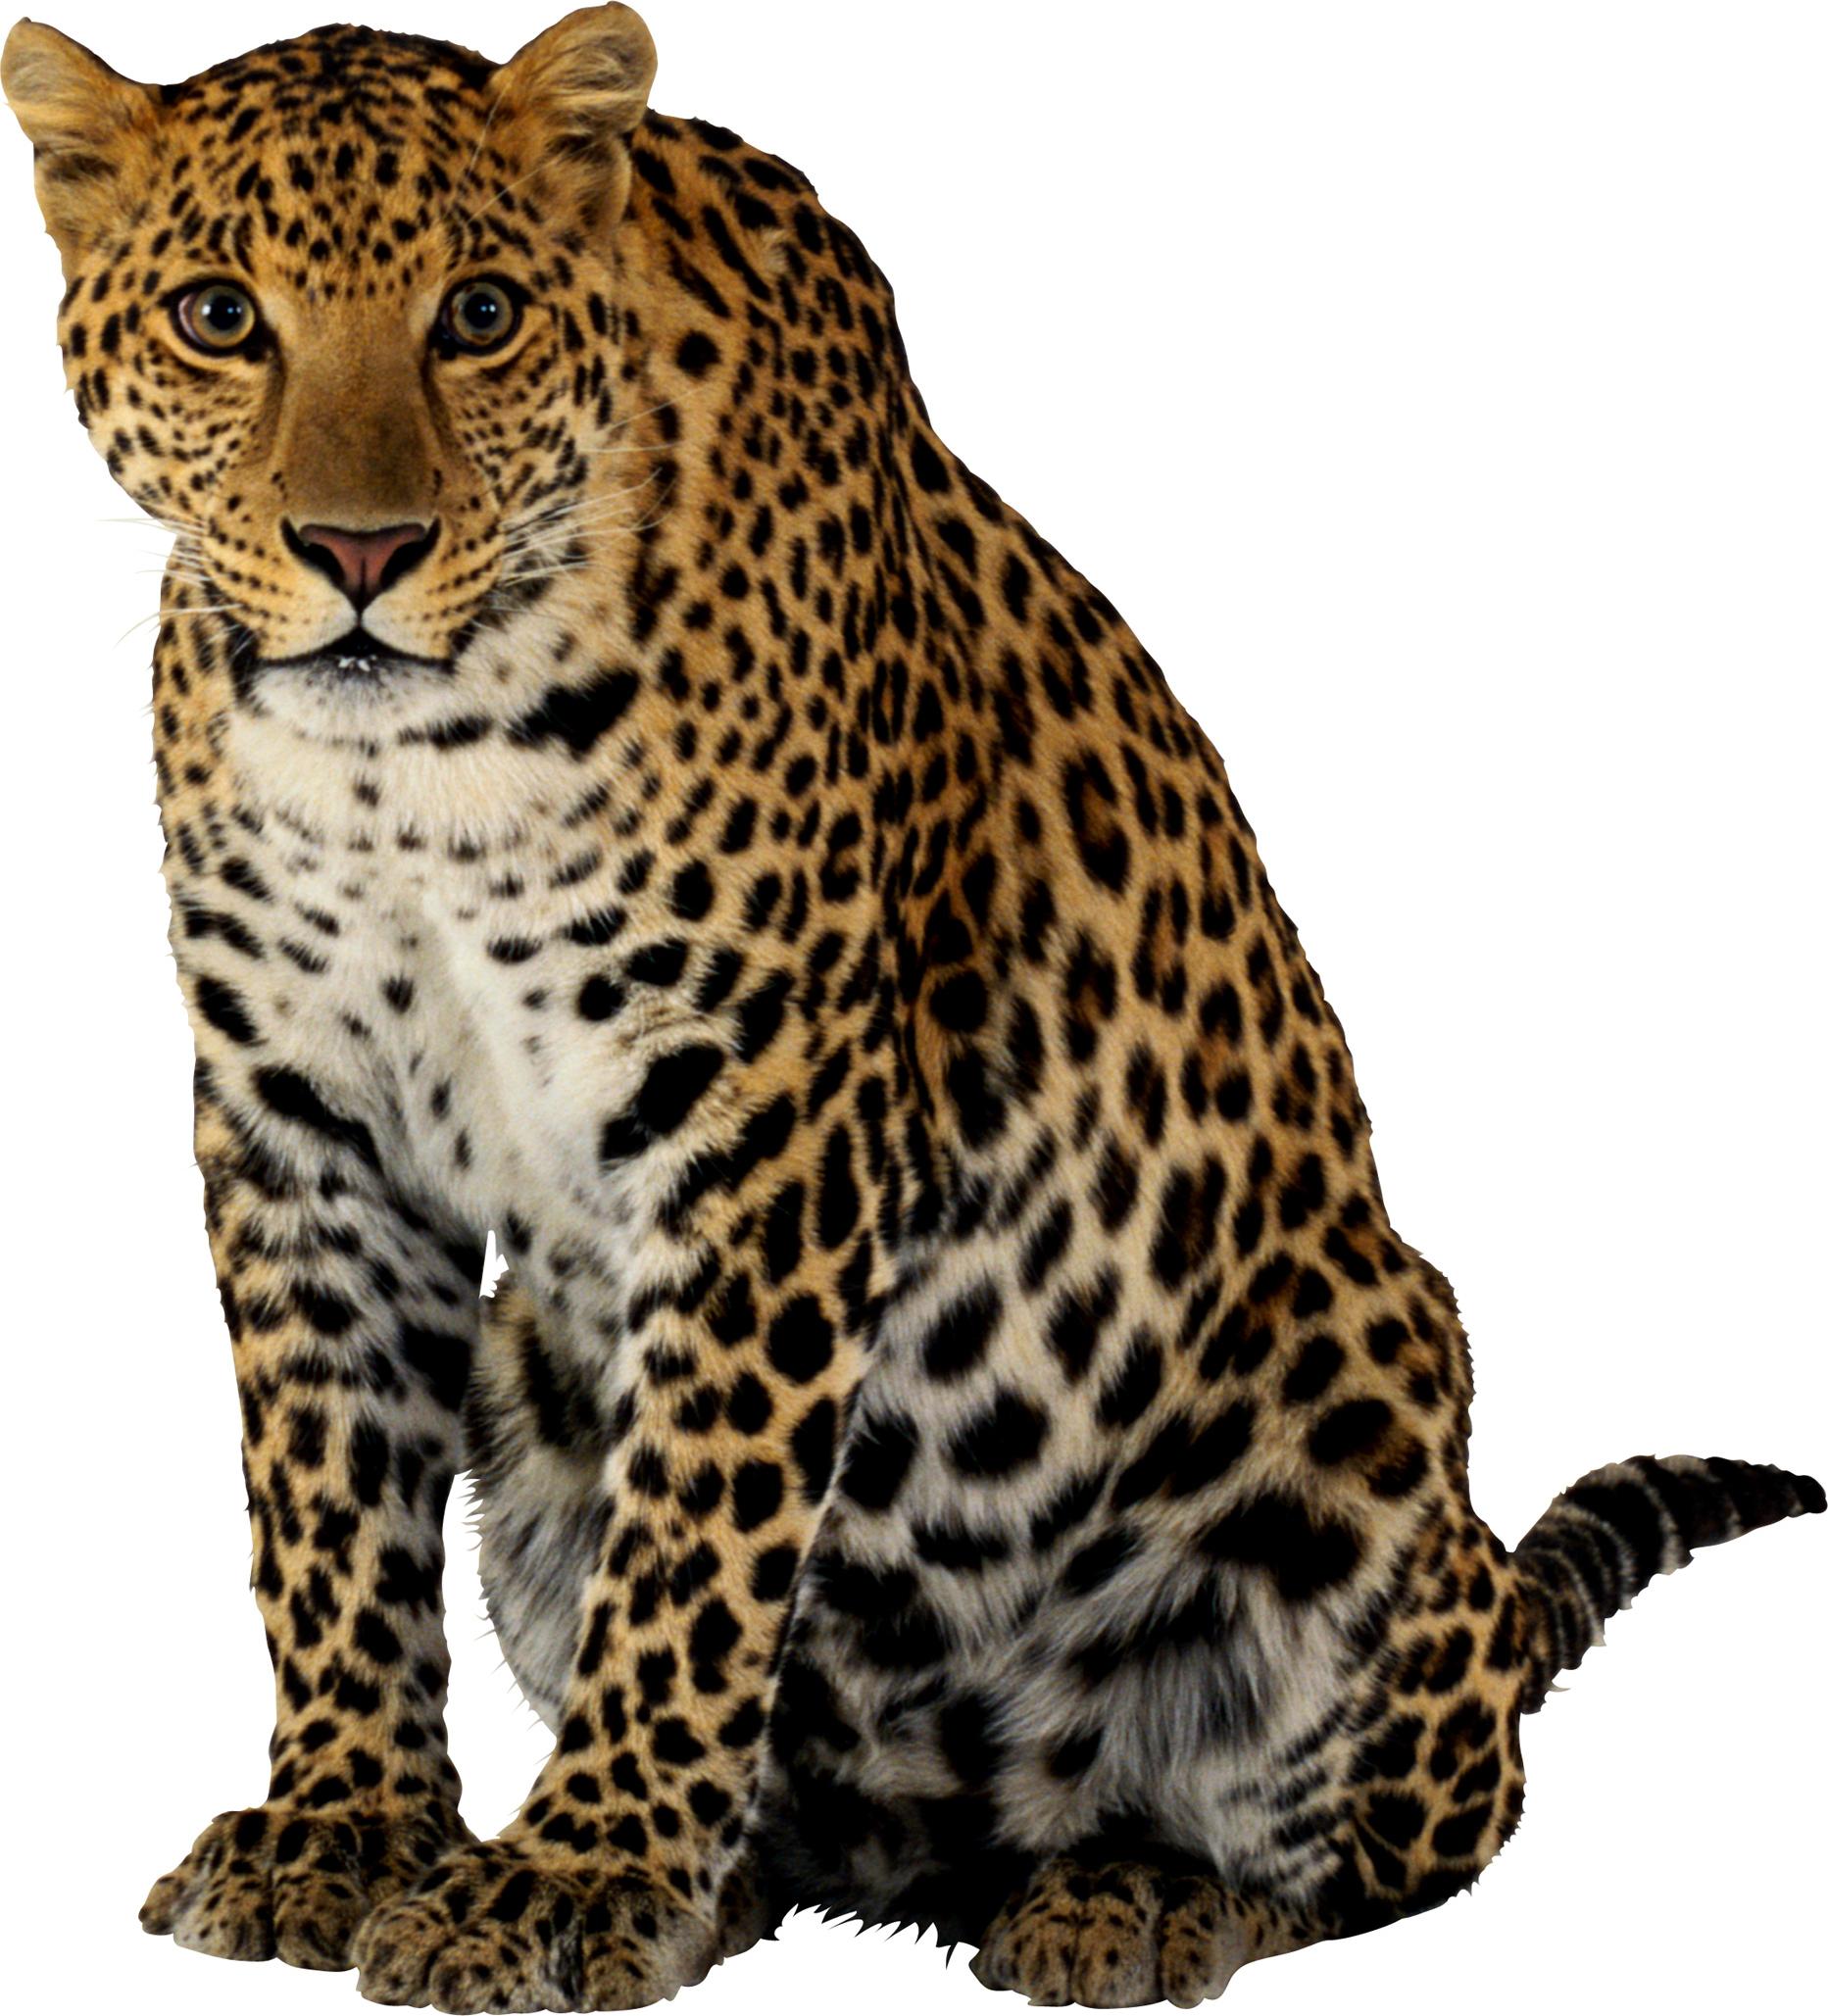 Leopard Sitting PNG Image